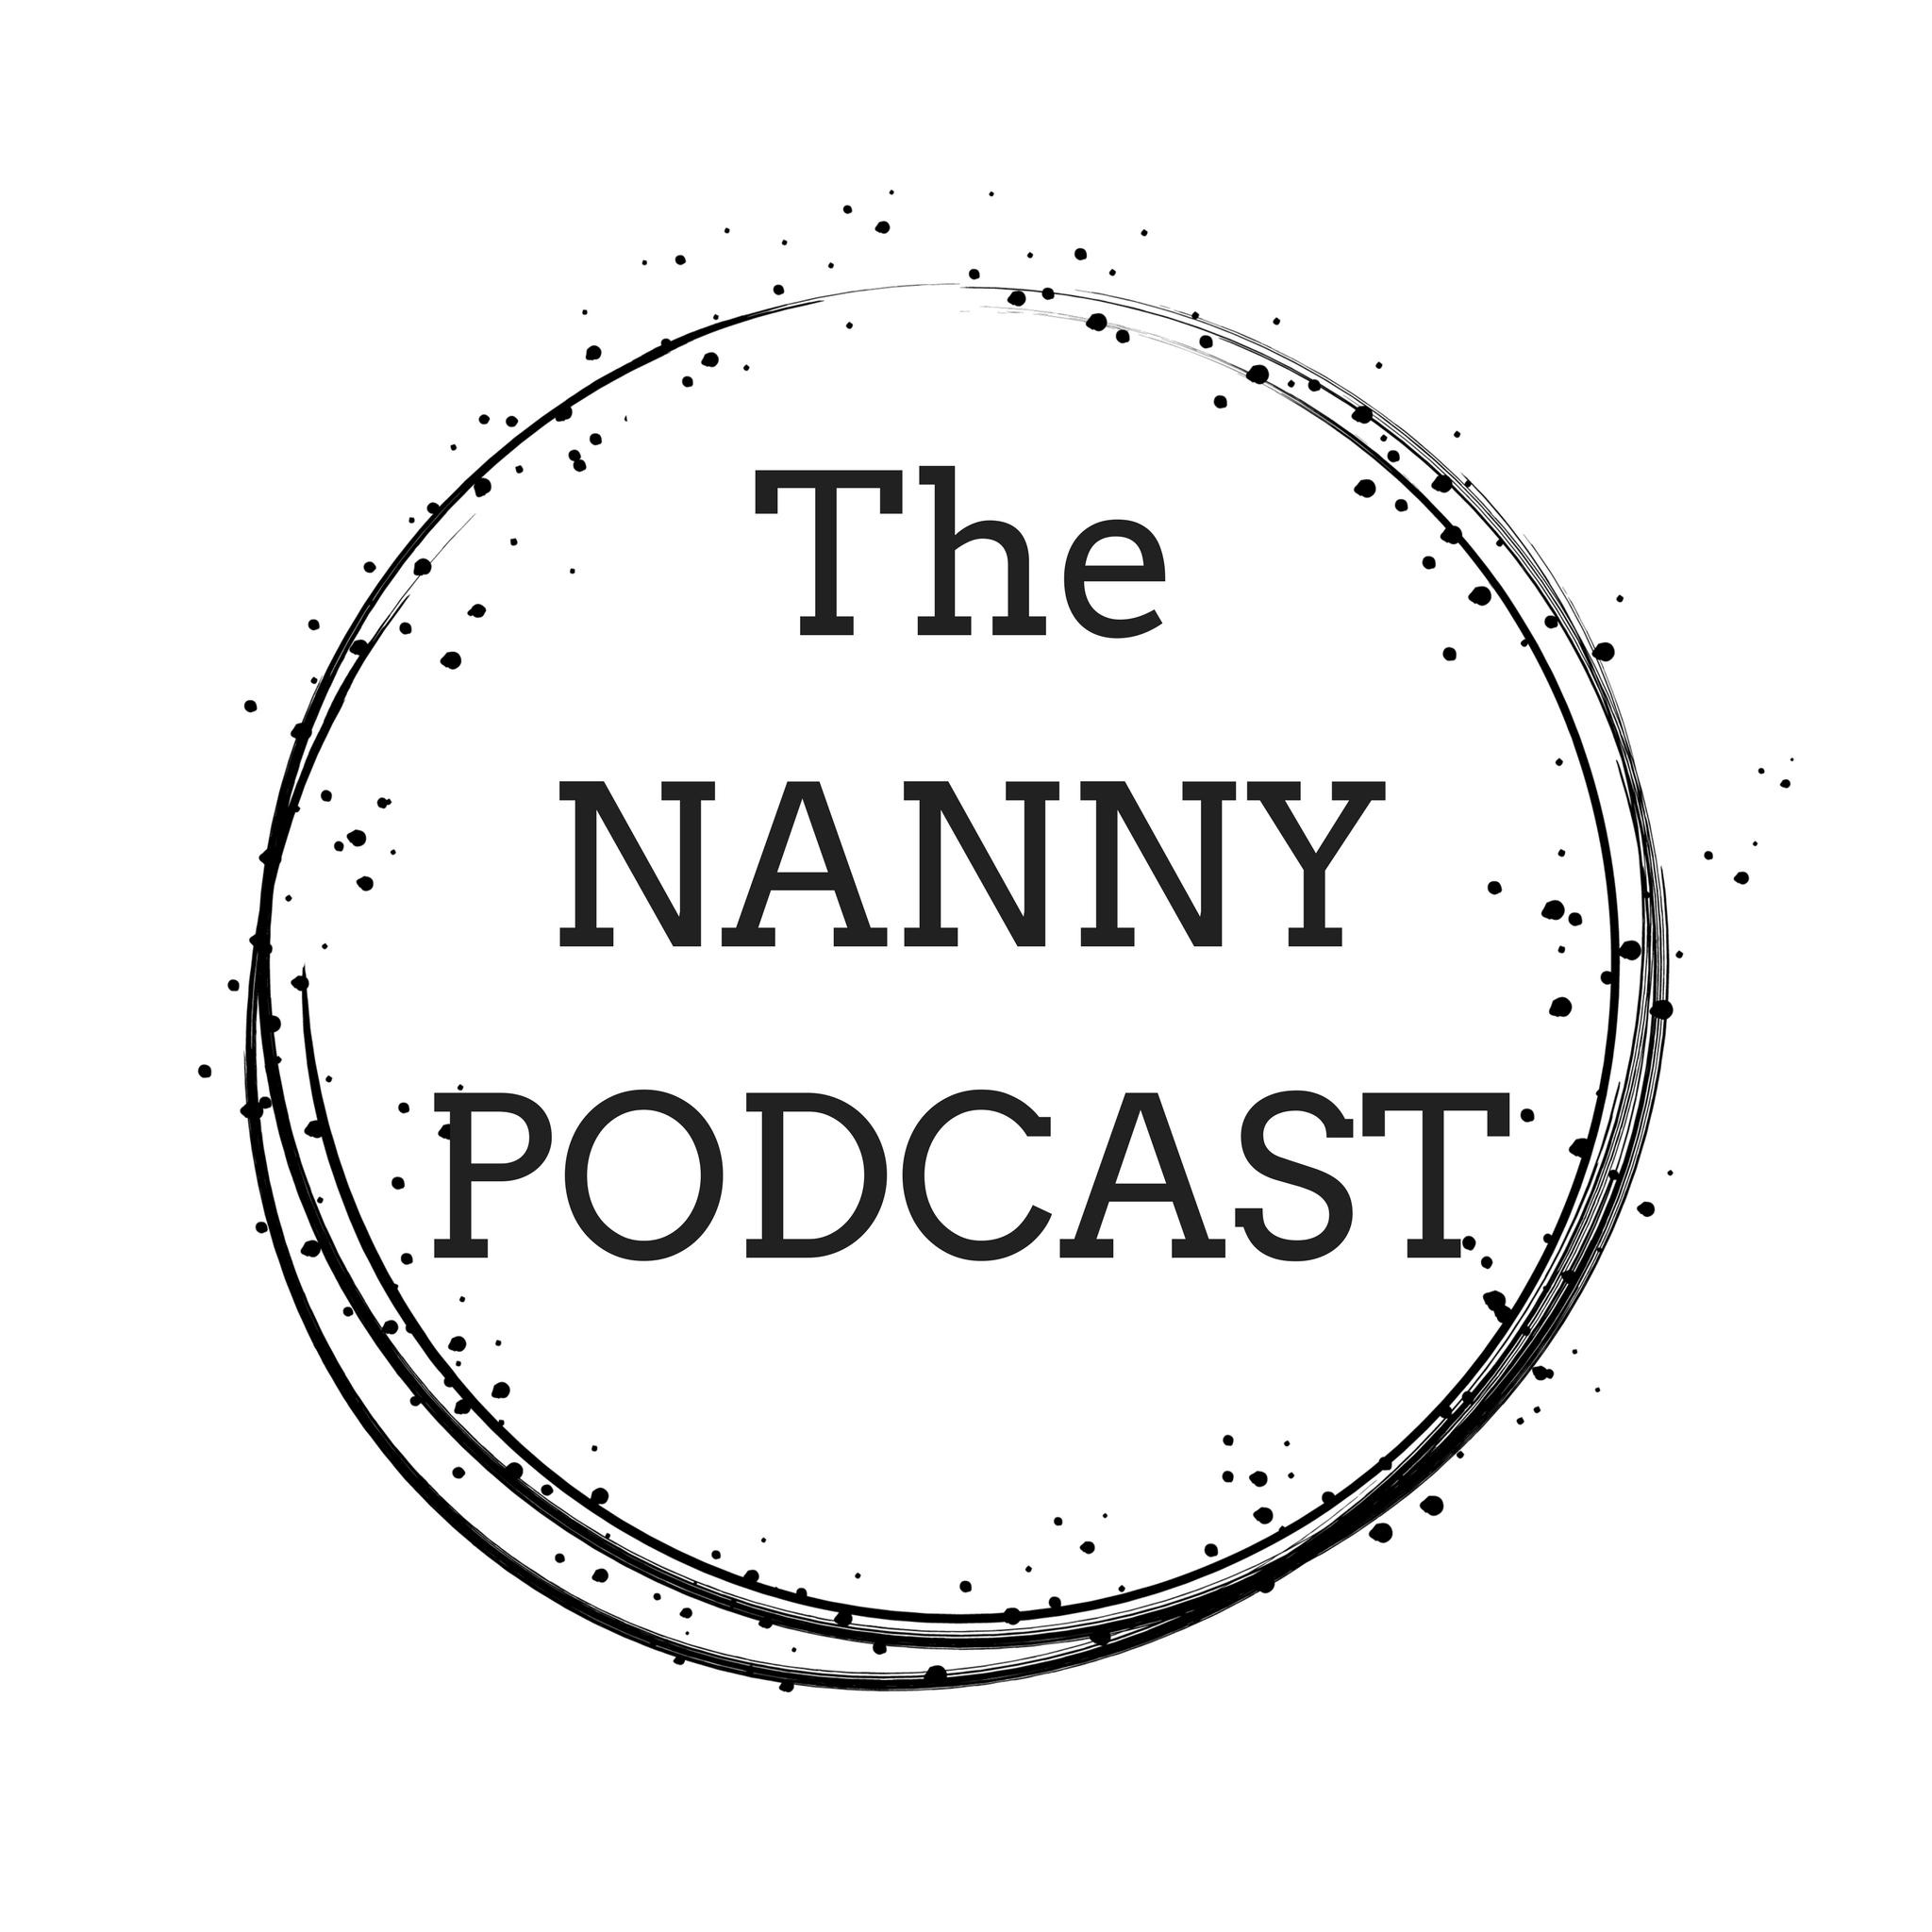 The Nanny Podcast show art